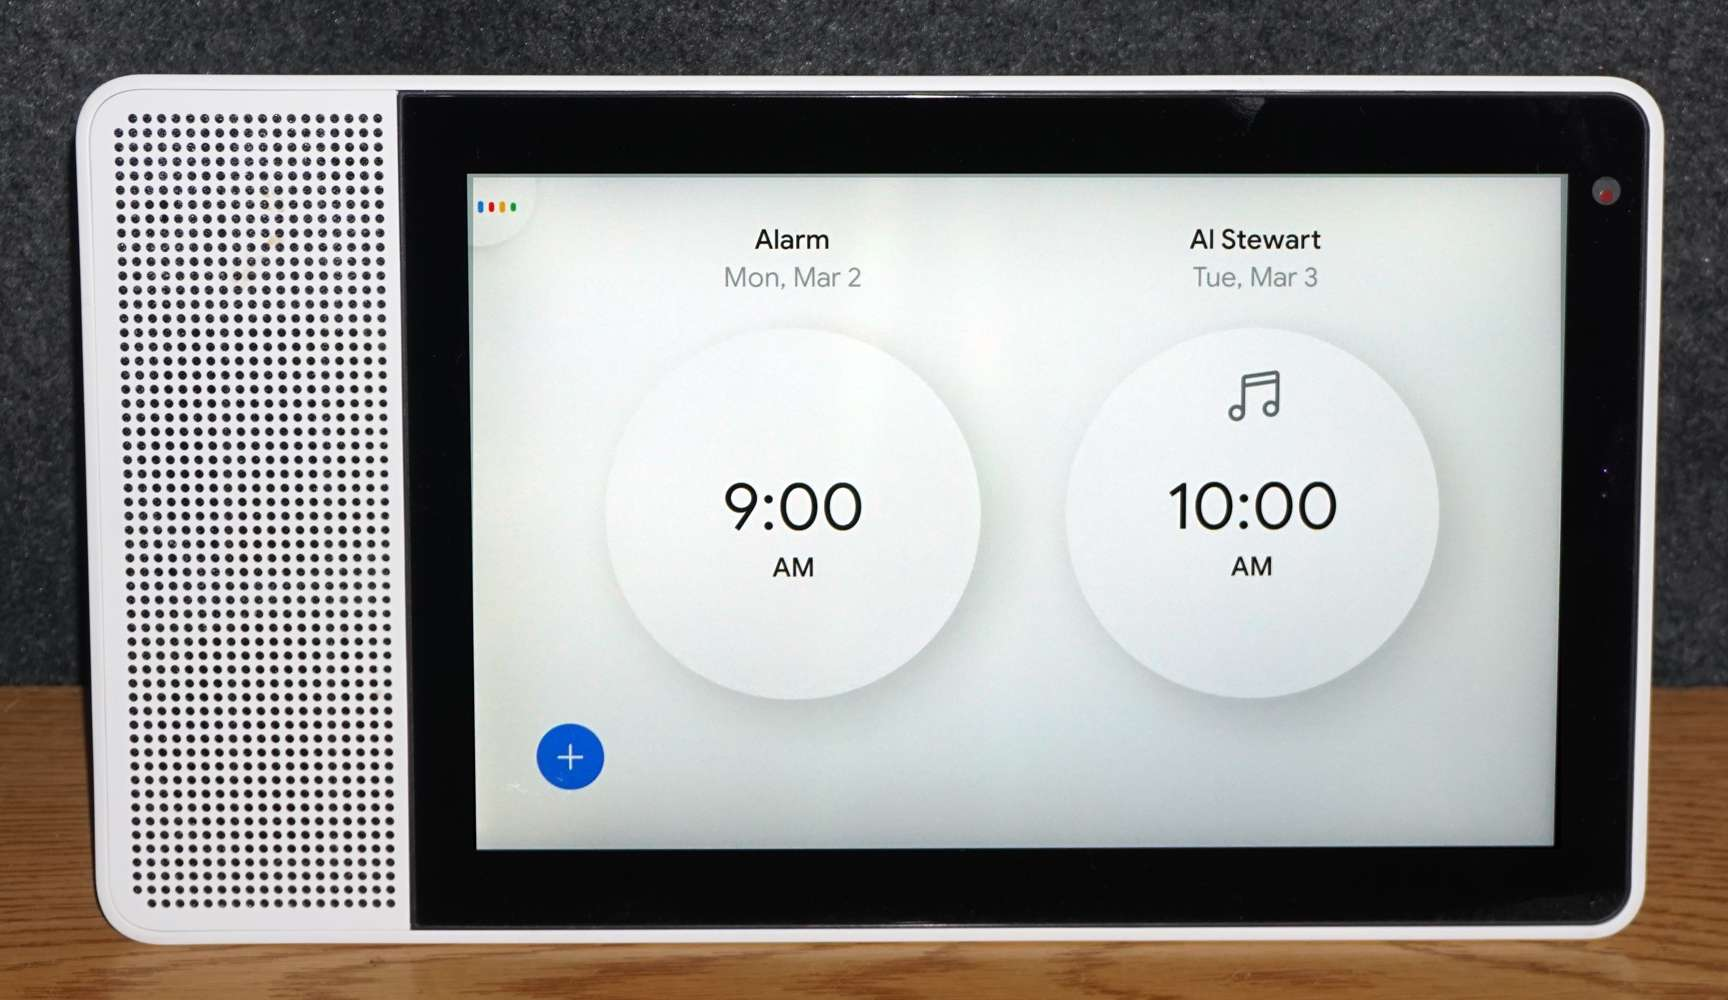 Alarm List on Lenovo Smart Display